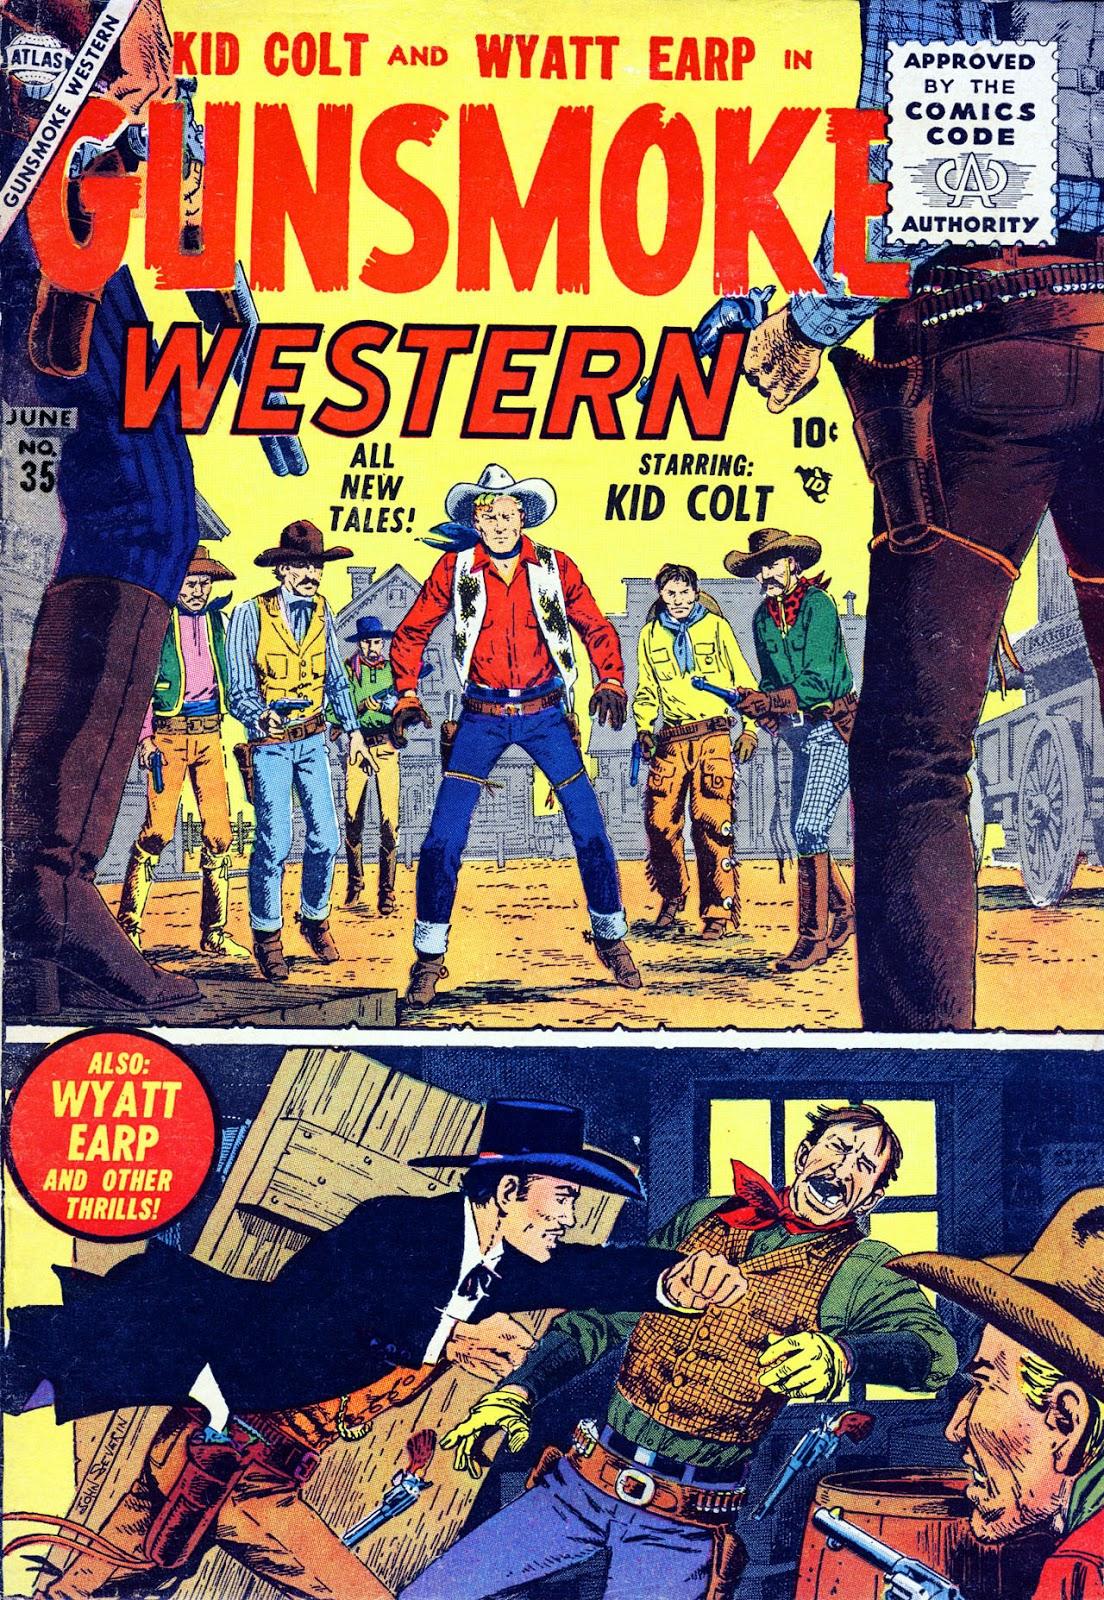 Gunsmoke Western issue 35 - Page 1